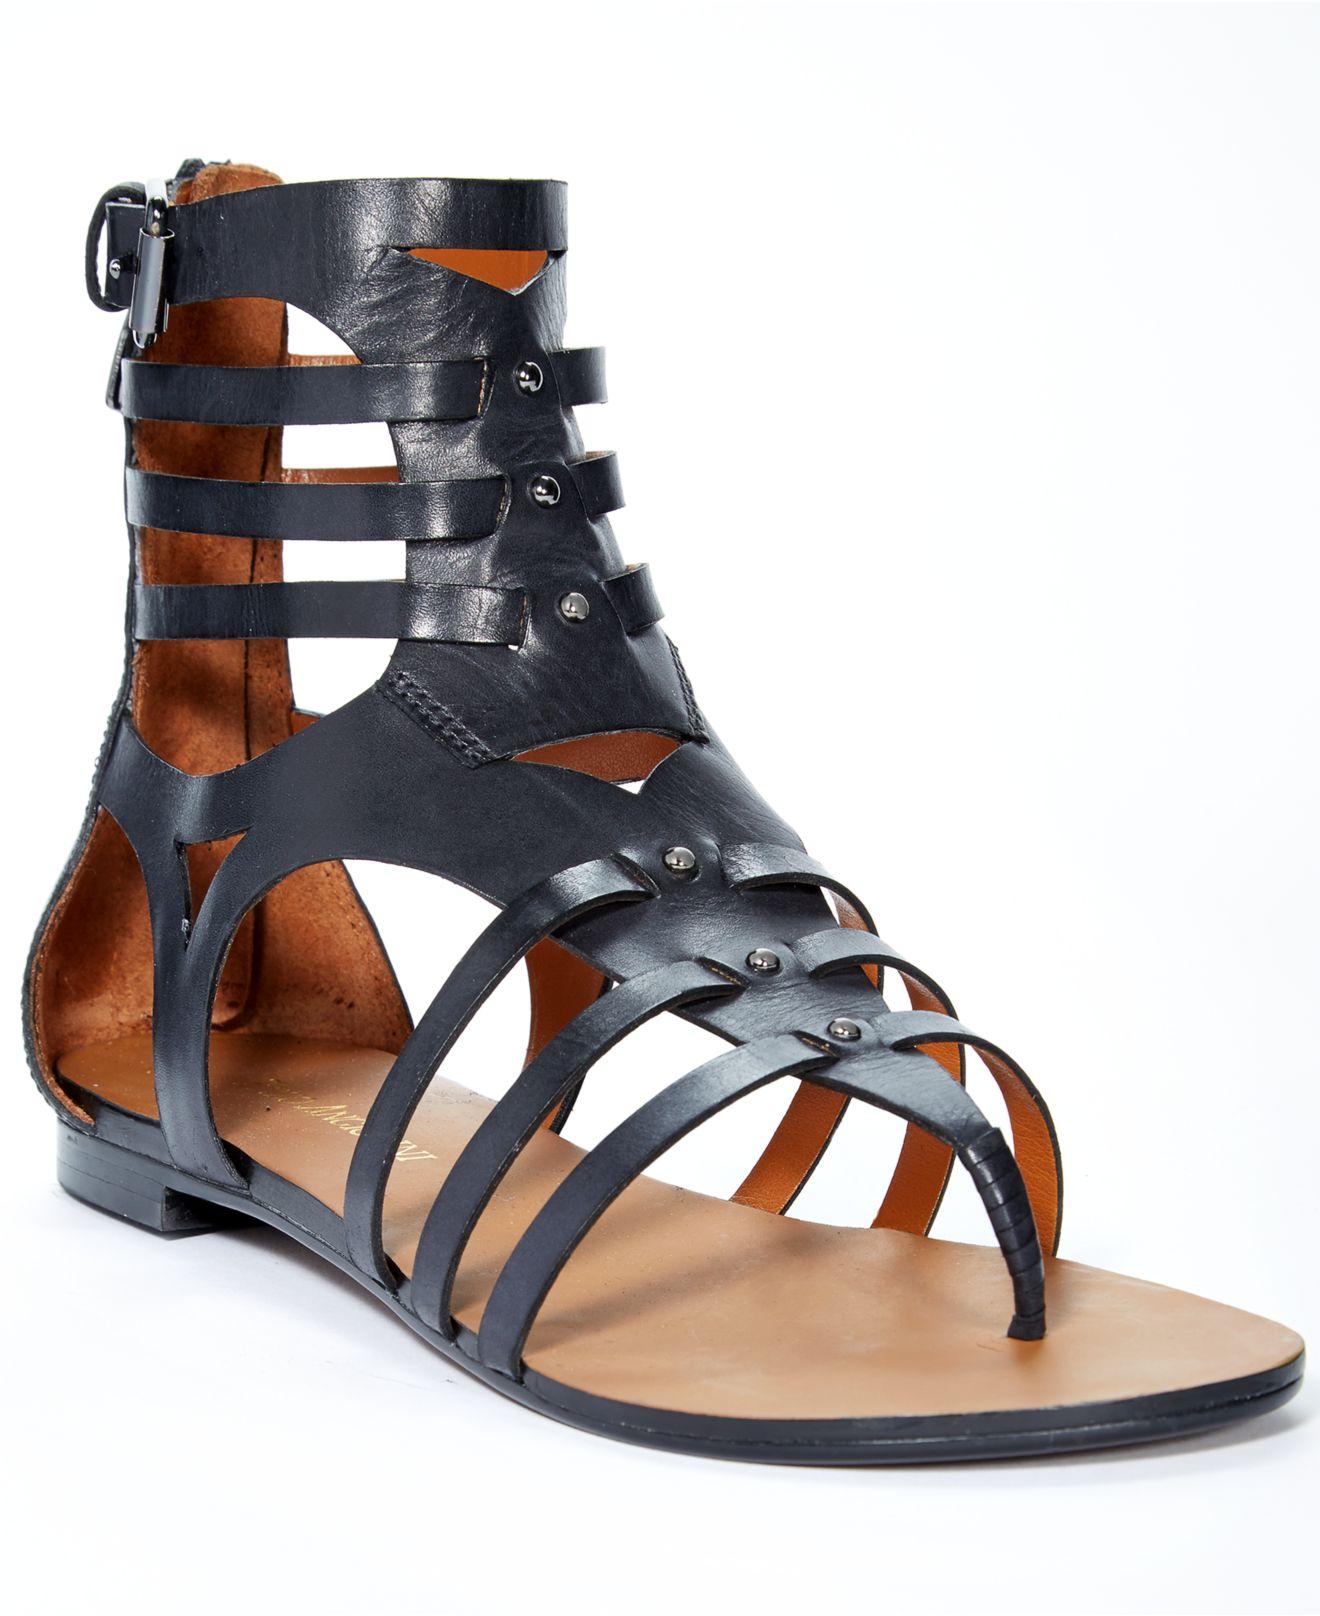 4fbe3b396b6 Lyst - Enzo Angiolini Makayla Gladiator Sandals in Black